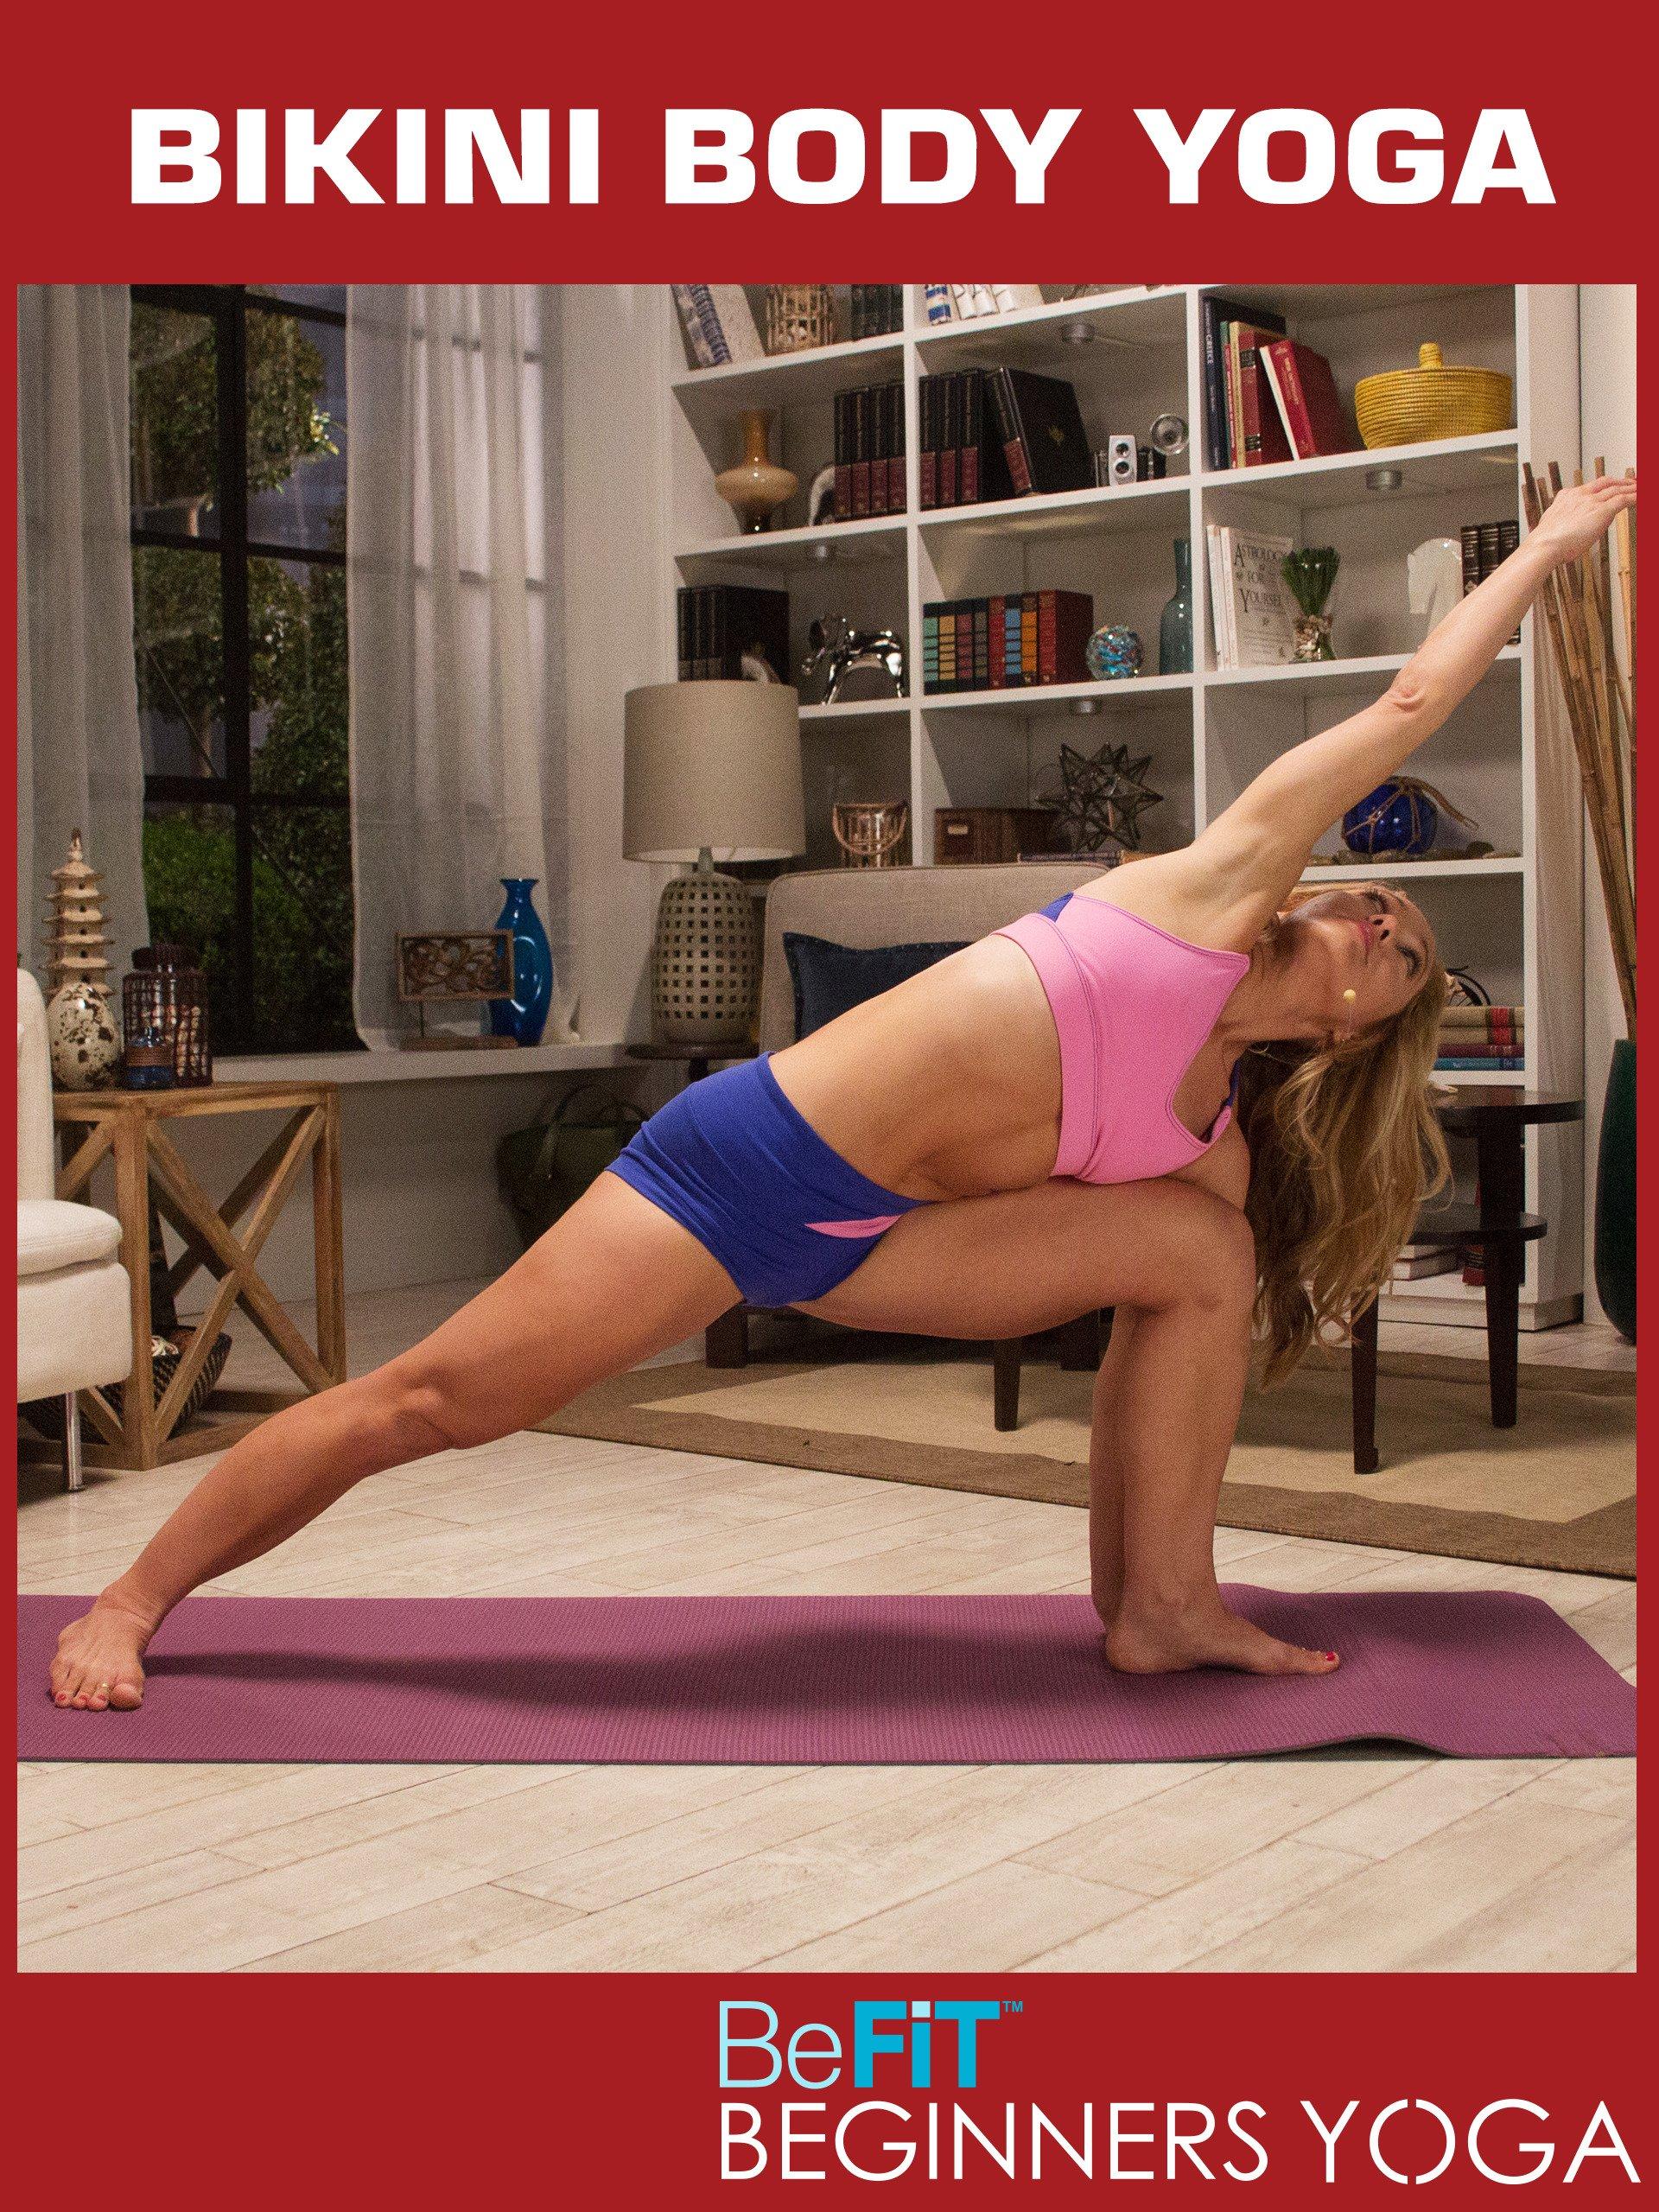 Watch BeFiT Beginners Yoga: Bikini Body Yoga Workout- Kino ...